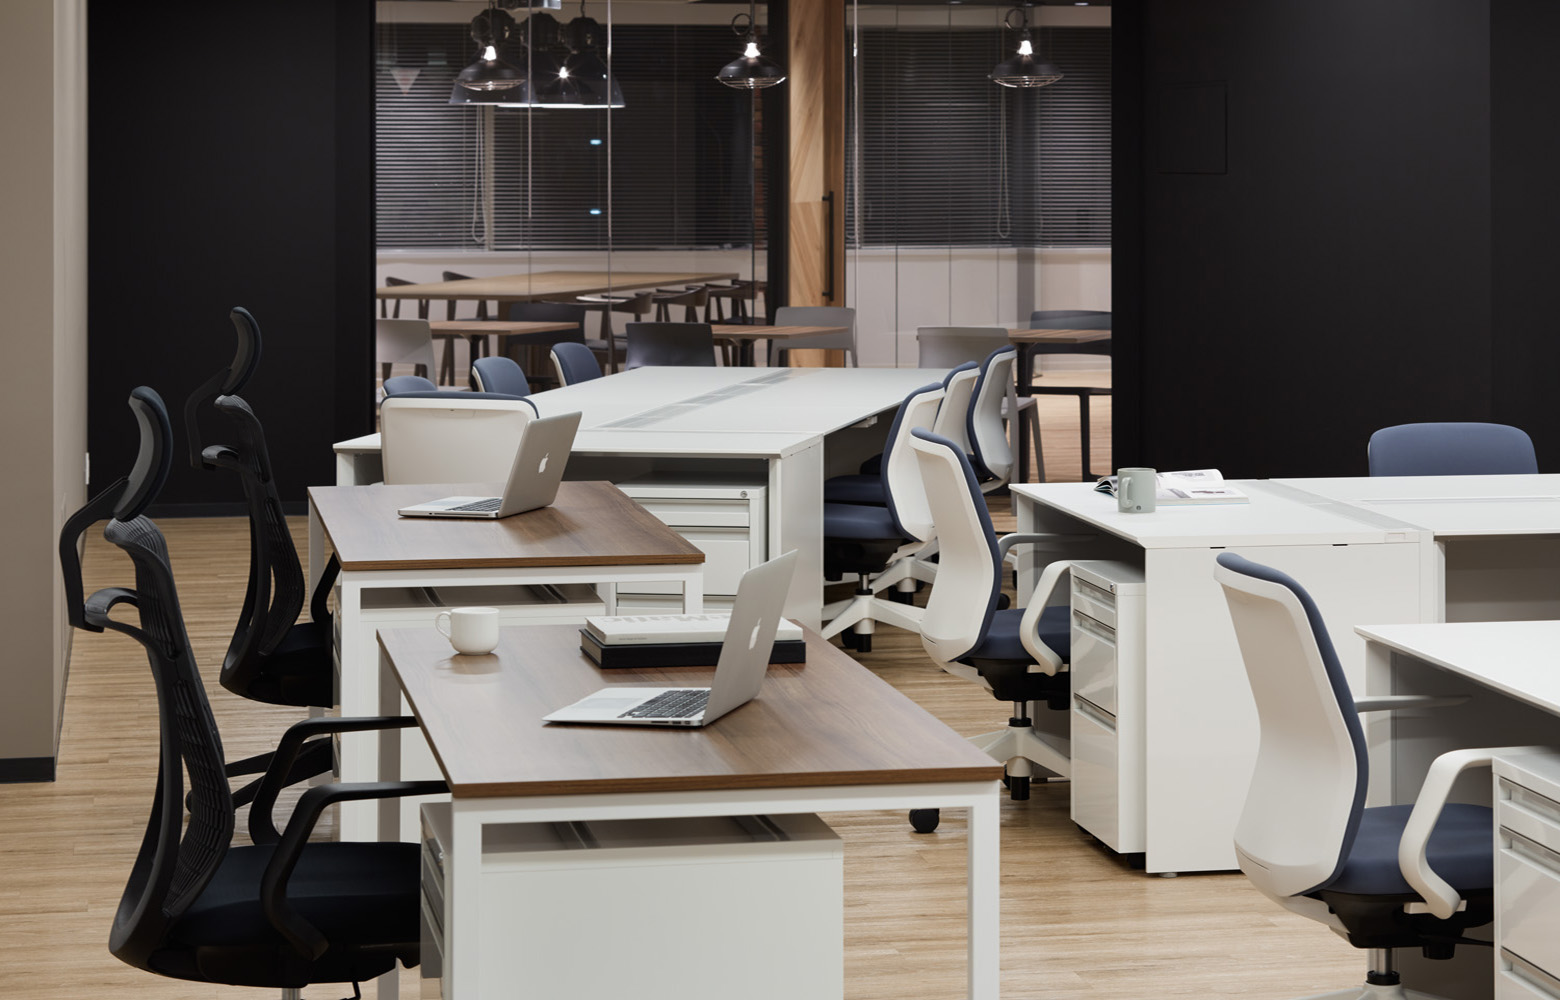 BEST株式会社 Work Space_2 デザイン・レイアウト事例